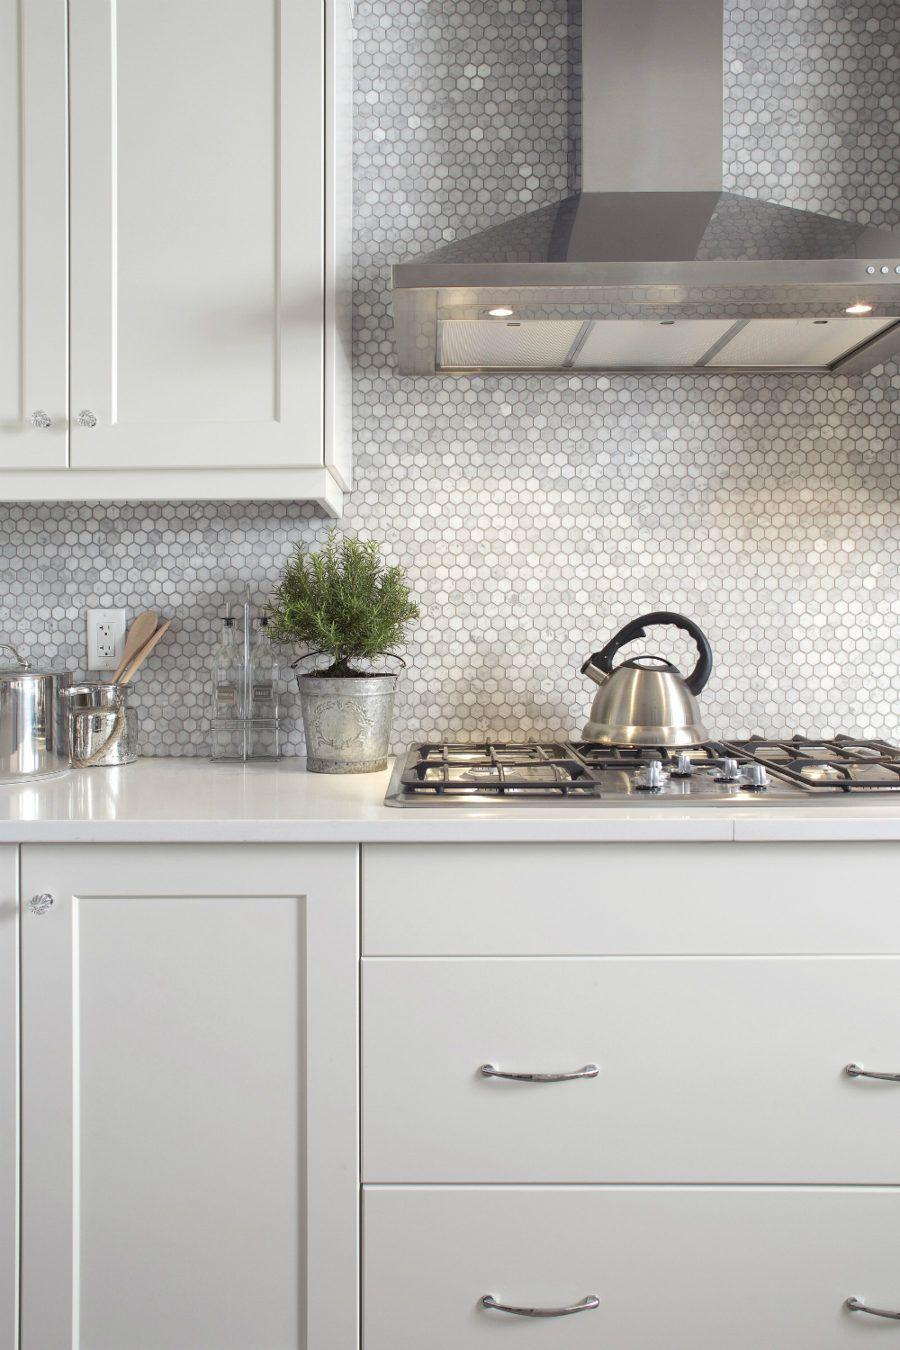 Modern Kitchen Backsplash Ideas For Cooking With Style Kitchen Backsplash Designs Modern Kitchen Backsplash Kitchen Splashback